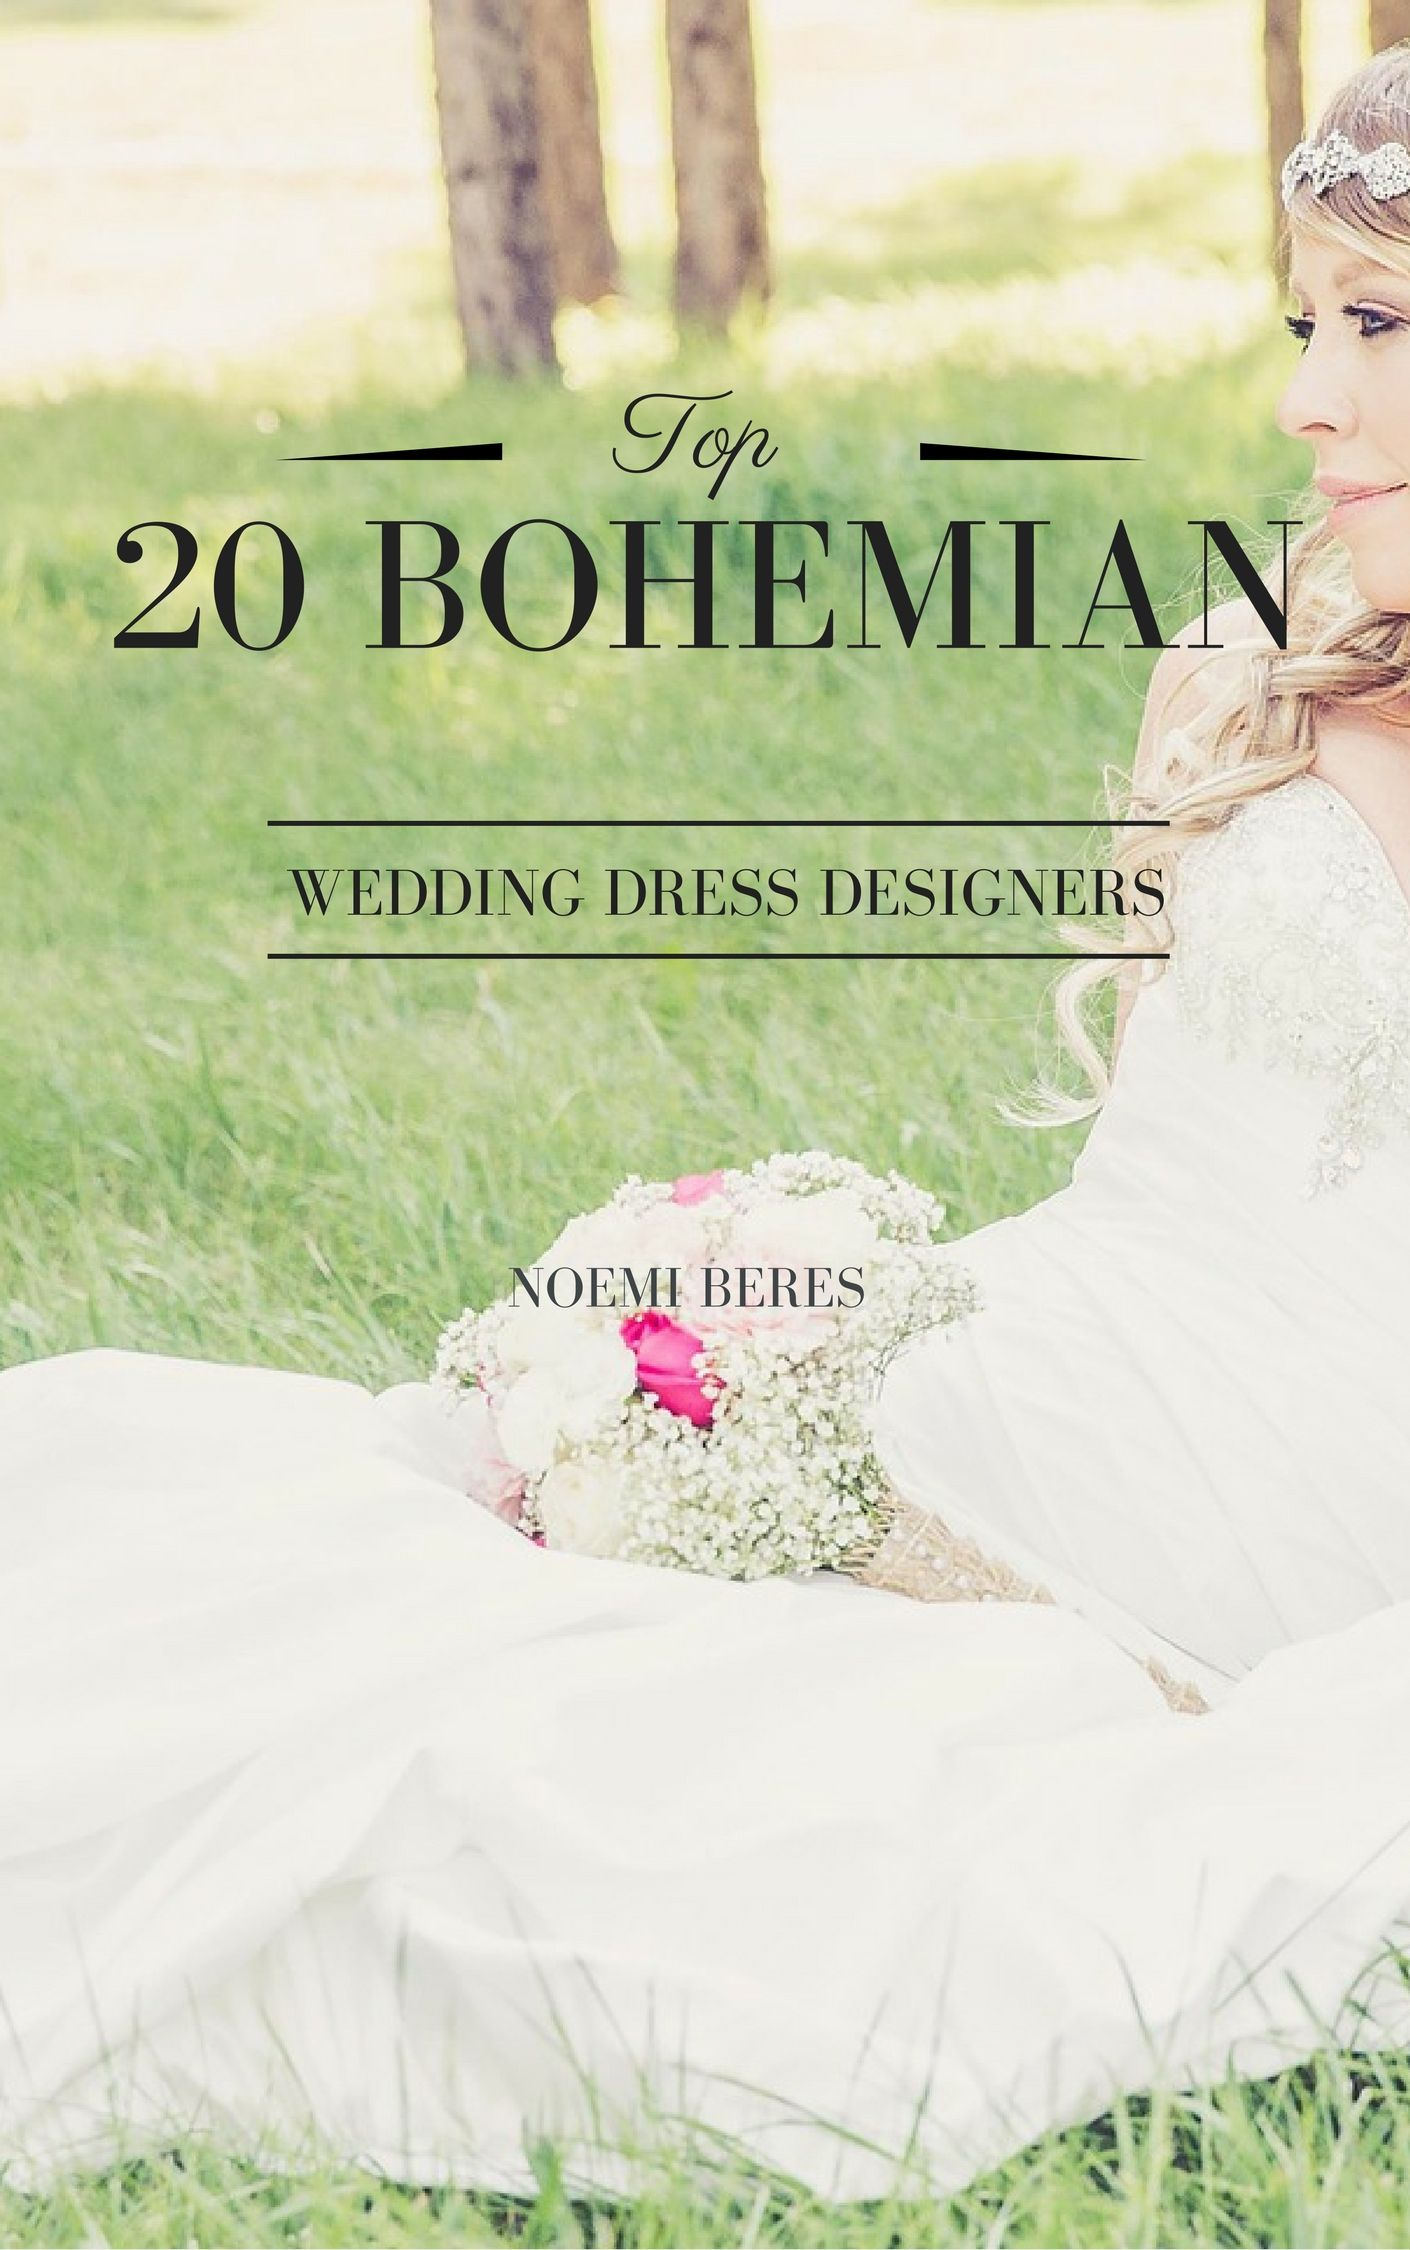 Free wedding dress catalogs  The top  bohemian wedding dress designers  Download your free